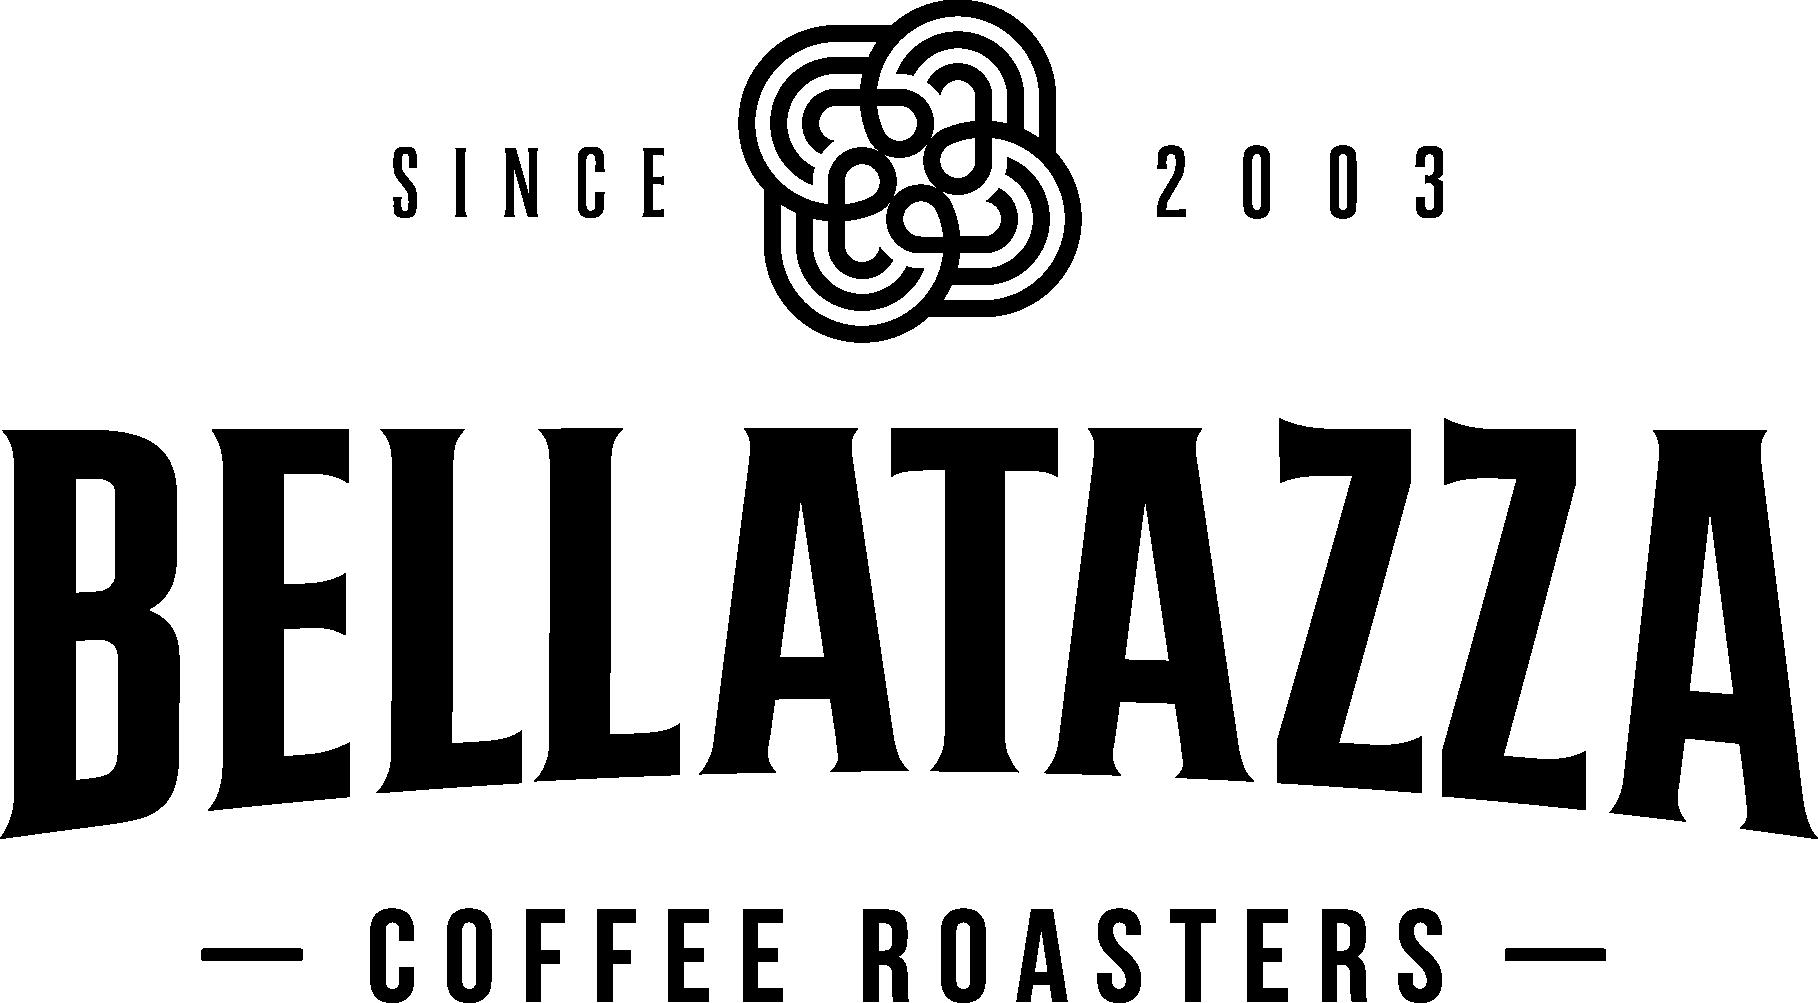 bellatazza_logo_black.png